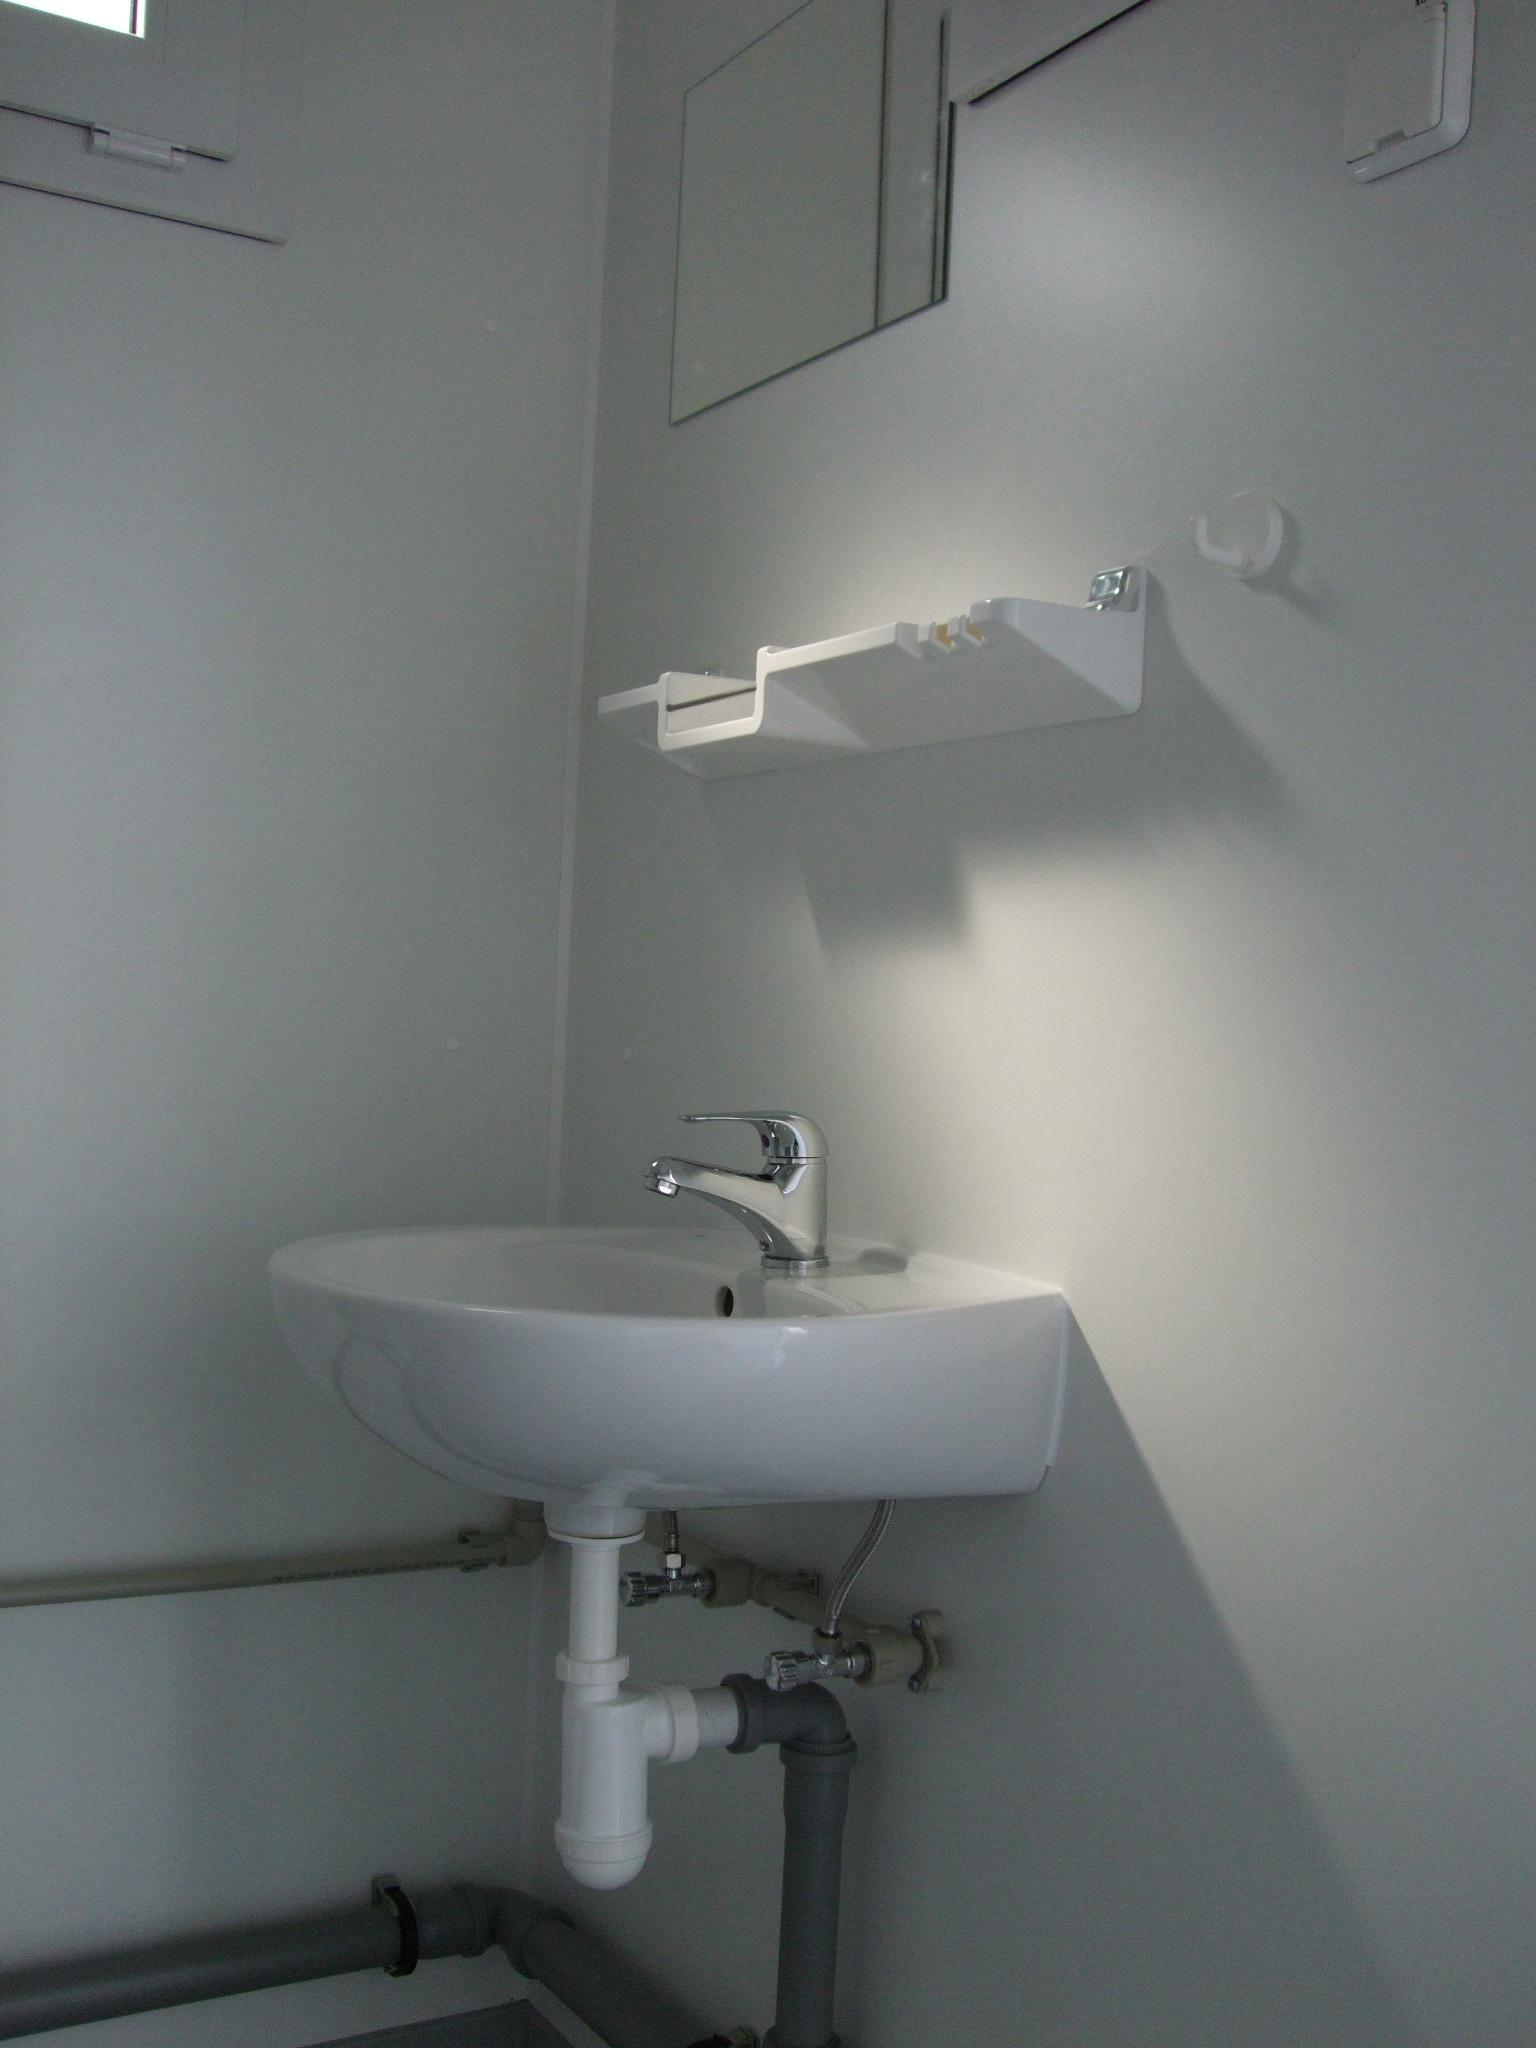 mobile toilette mieten toilettencontainer kaufen. Black Bedroom Furniture Sets. Home Design Ideas